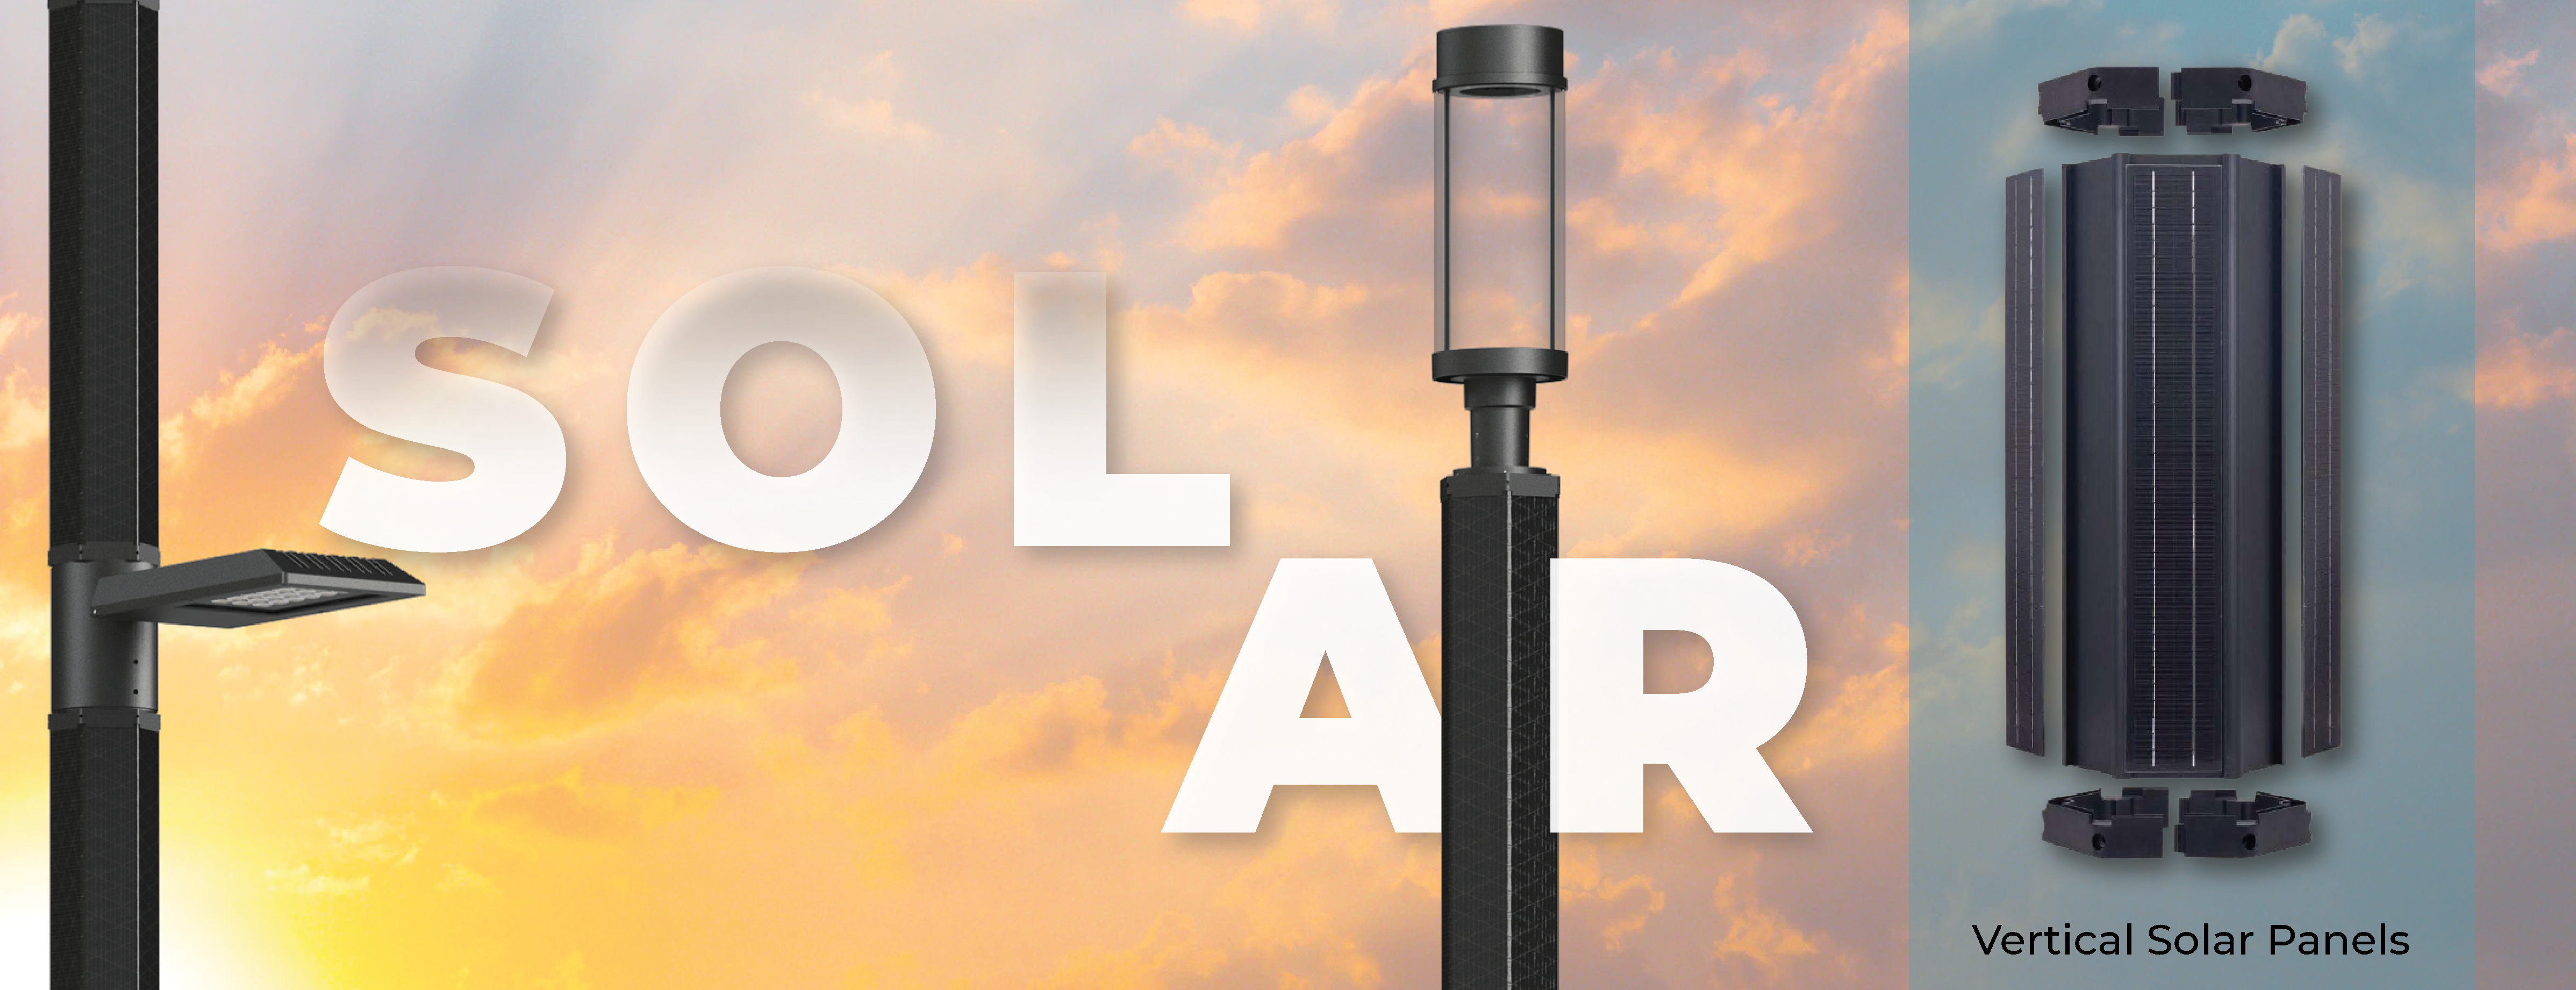 solar1-01 image